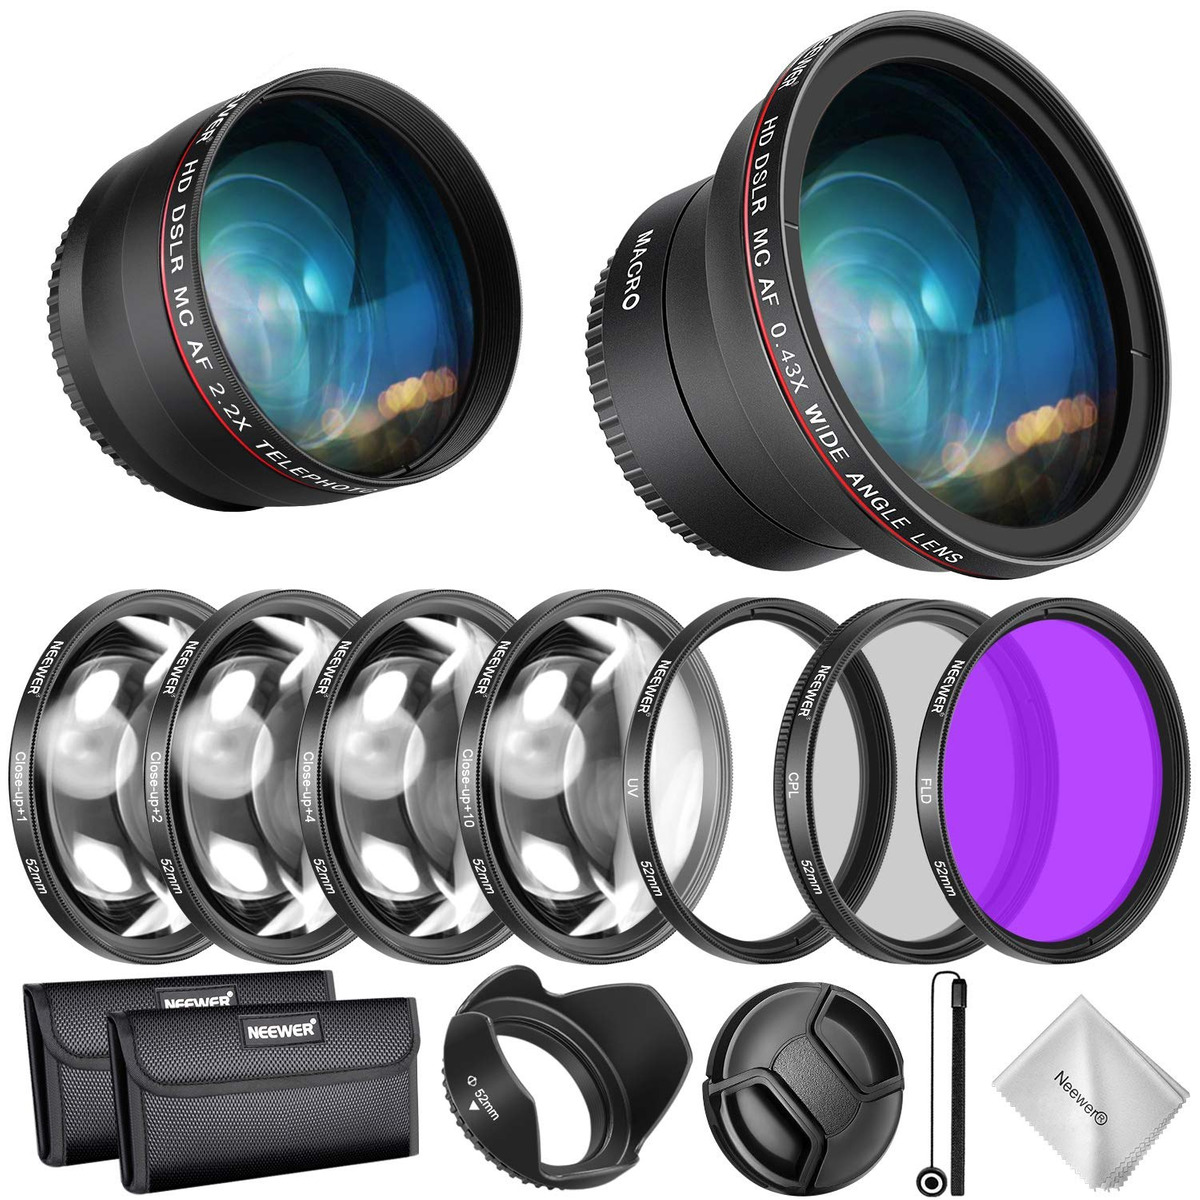 28mm f//3.5 Macro IS STM M Lente Capucha de reemplazo de lente ES-22 para Canon EF